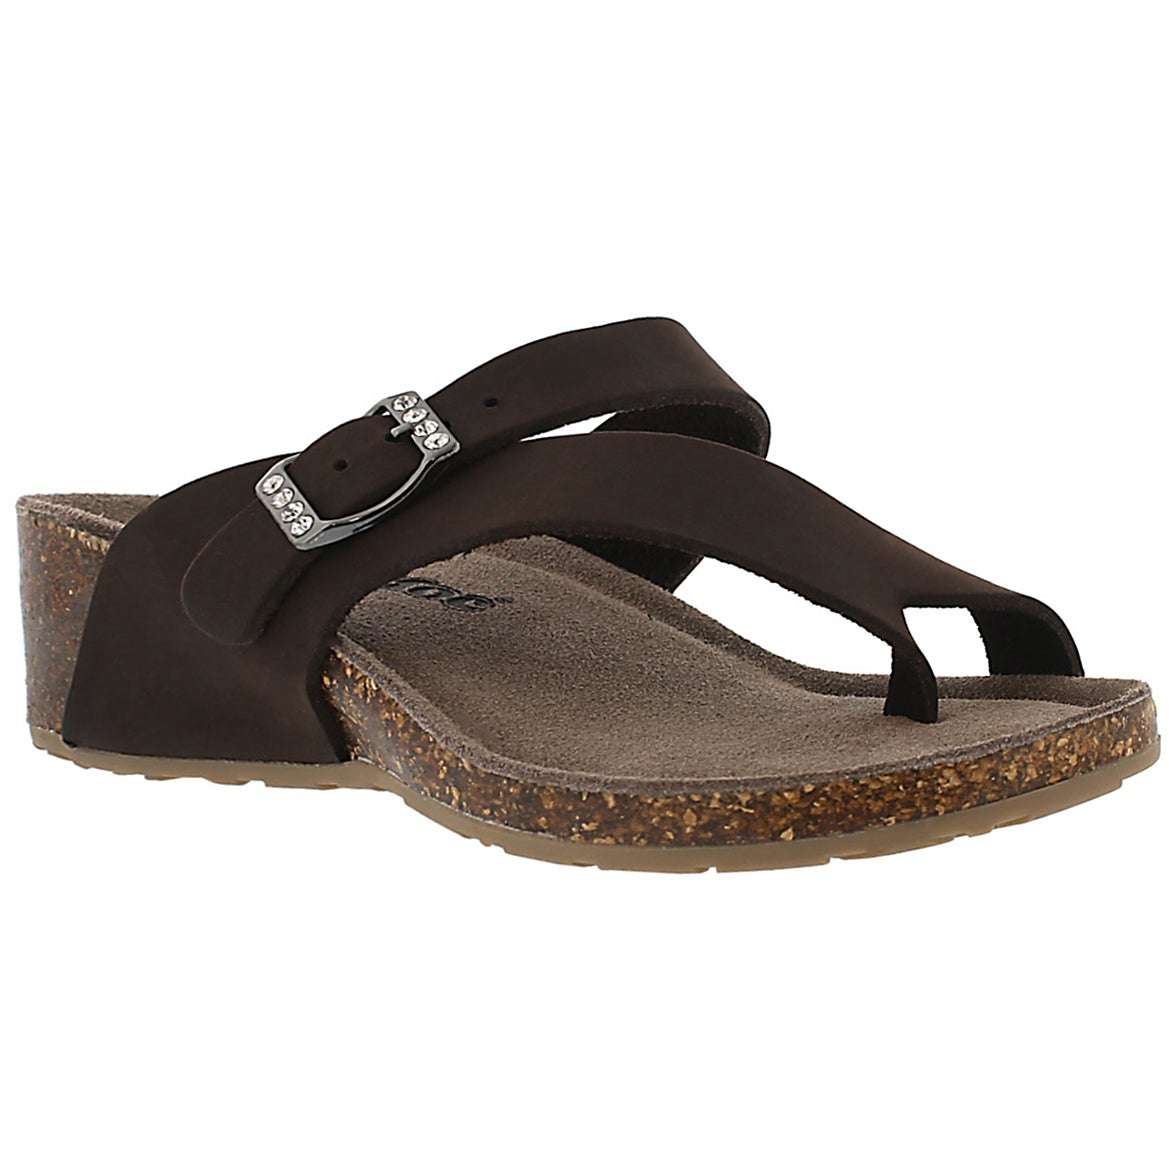 Women's AMBER 3 brown memory foam sandals